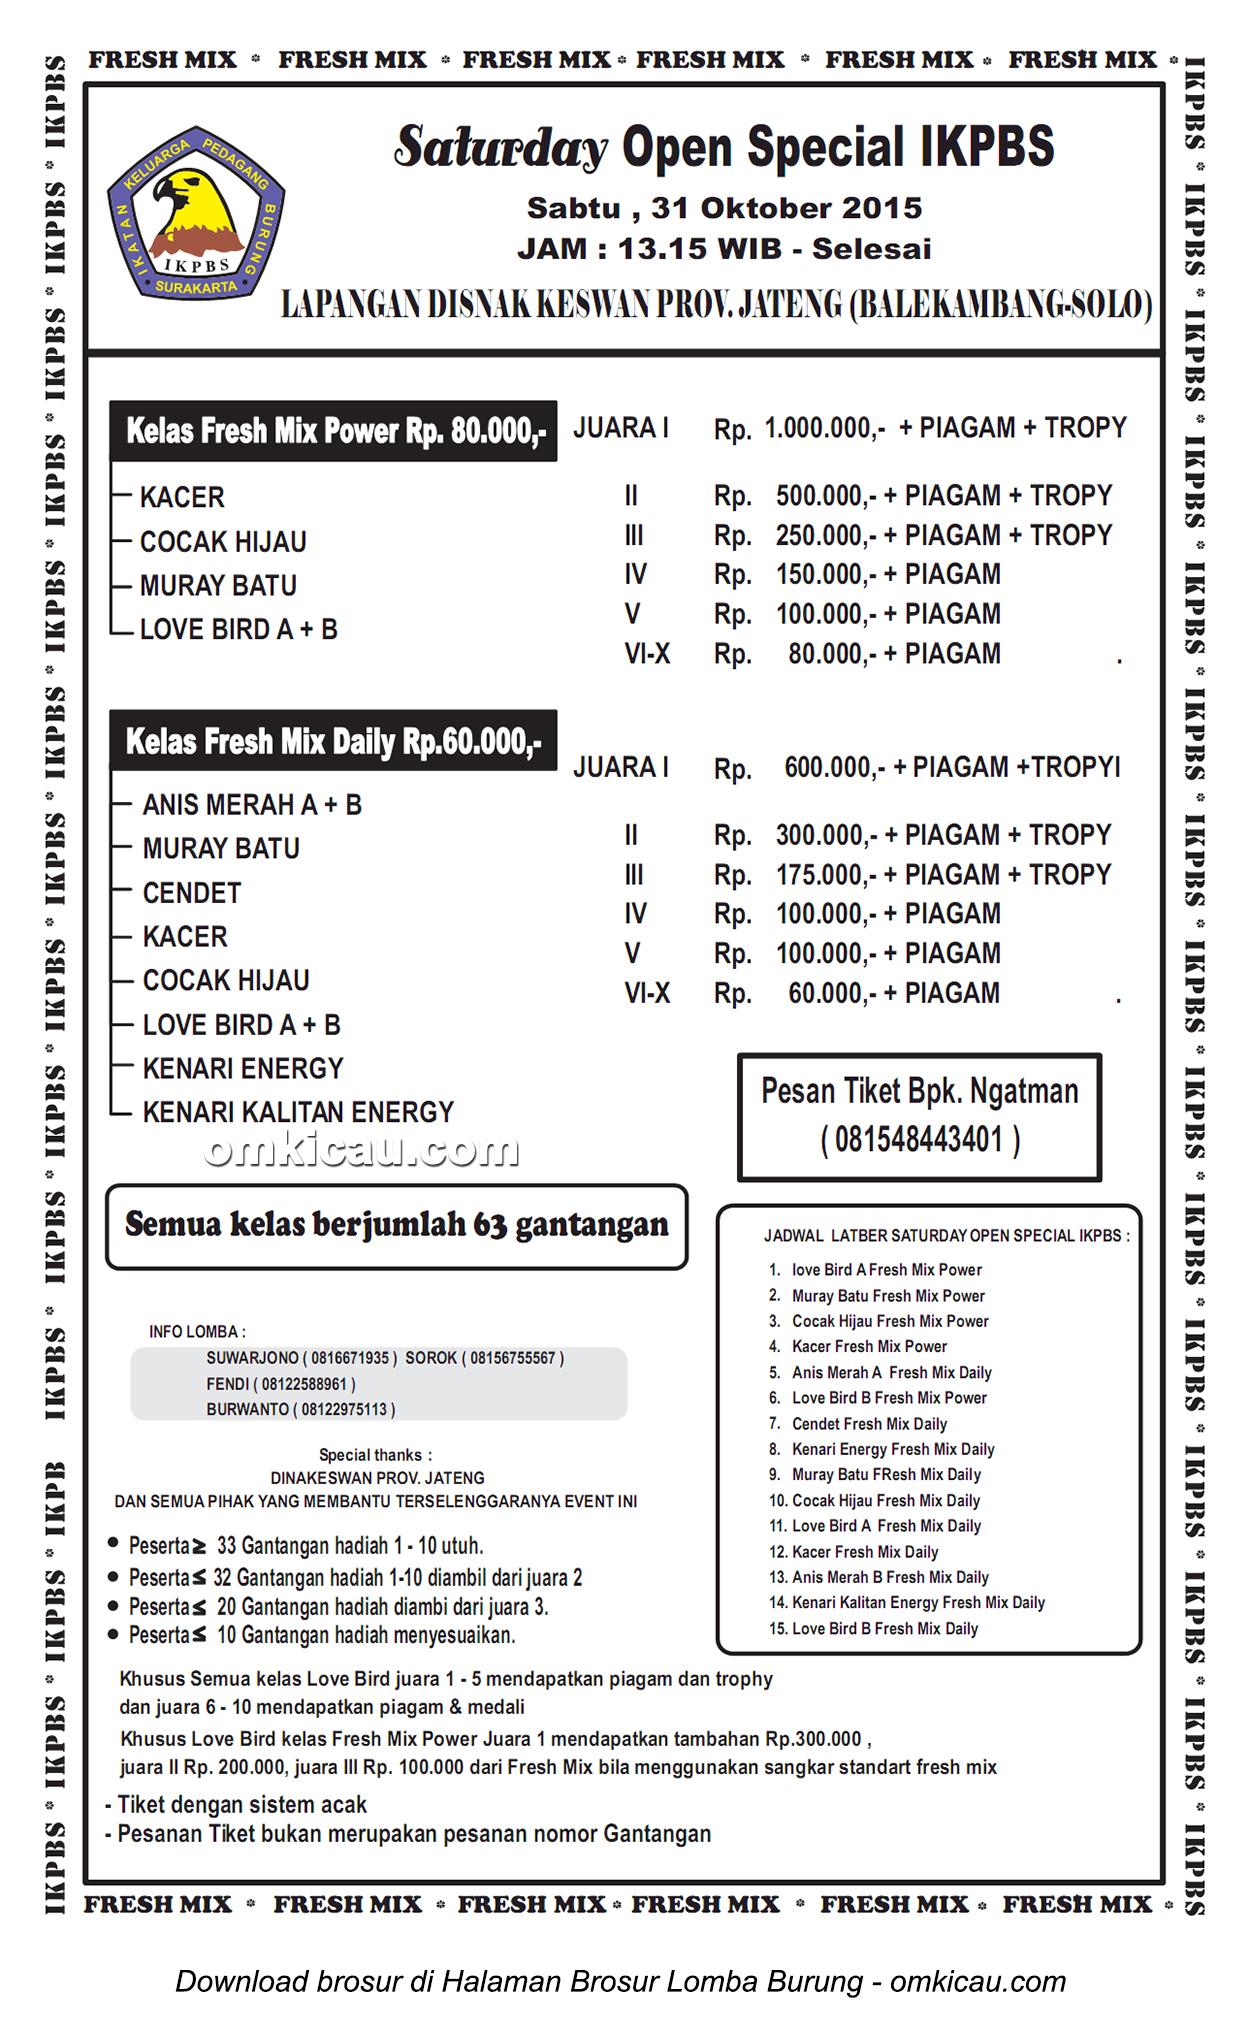 Brosur Lomba Burung Berkicau Saturday Open Special IKPBS, Solo, 31 Oktober 2015